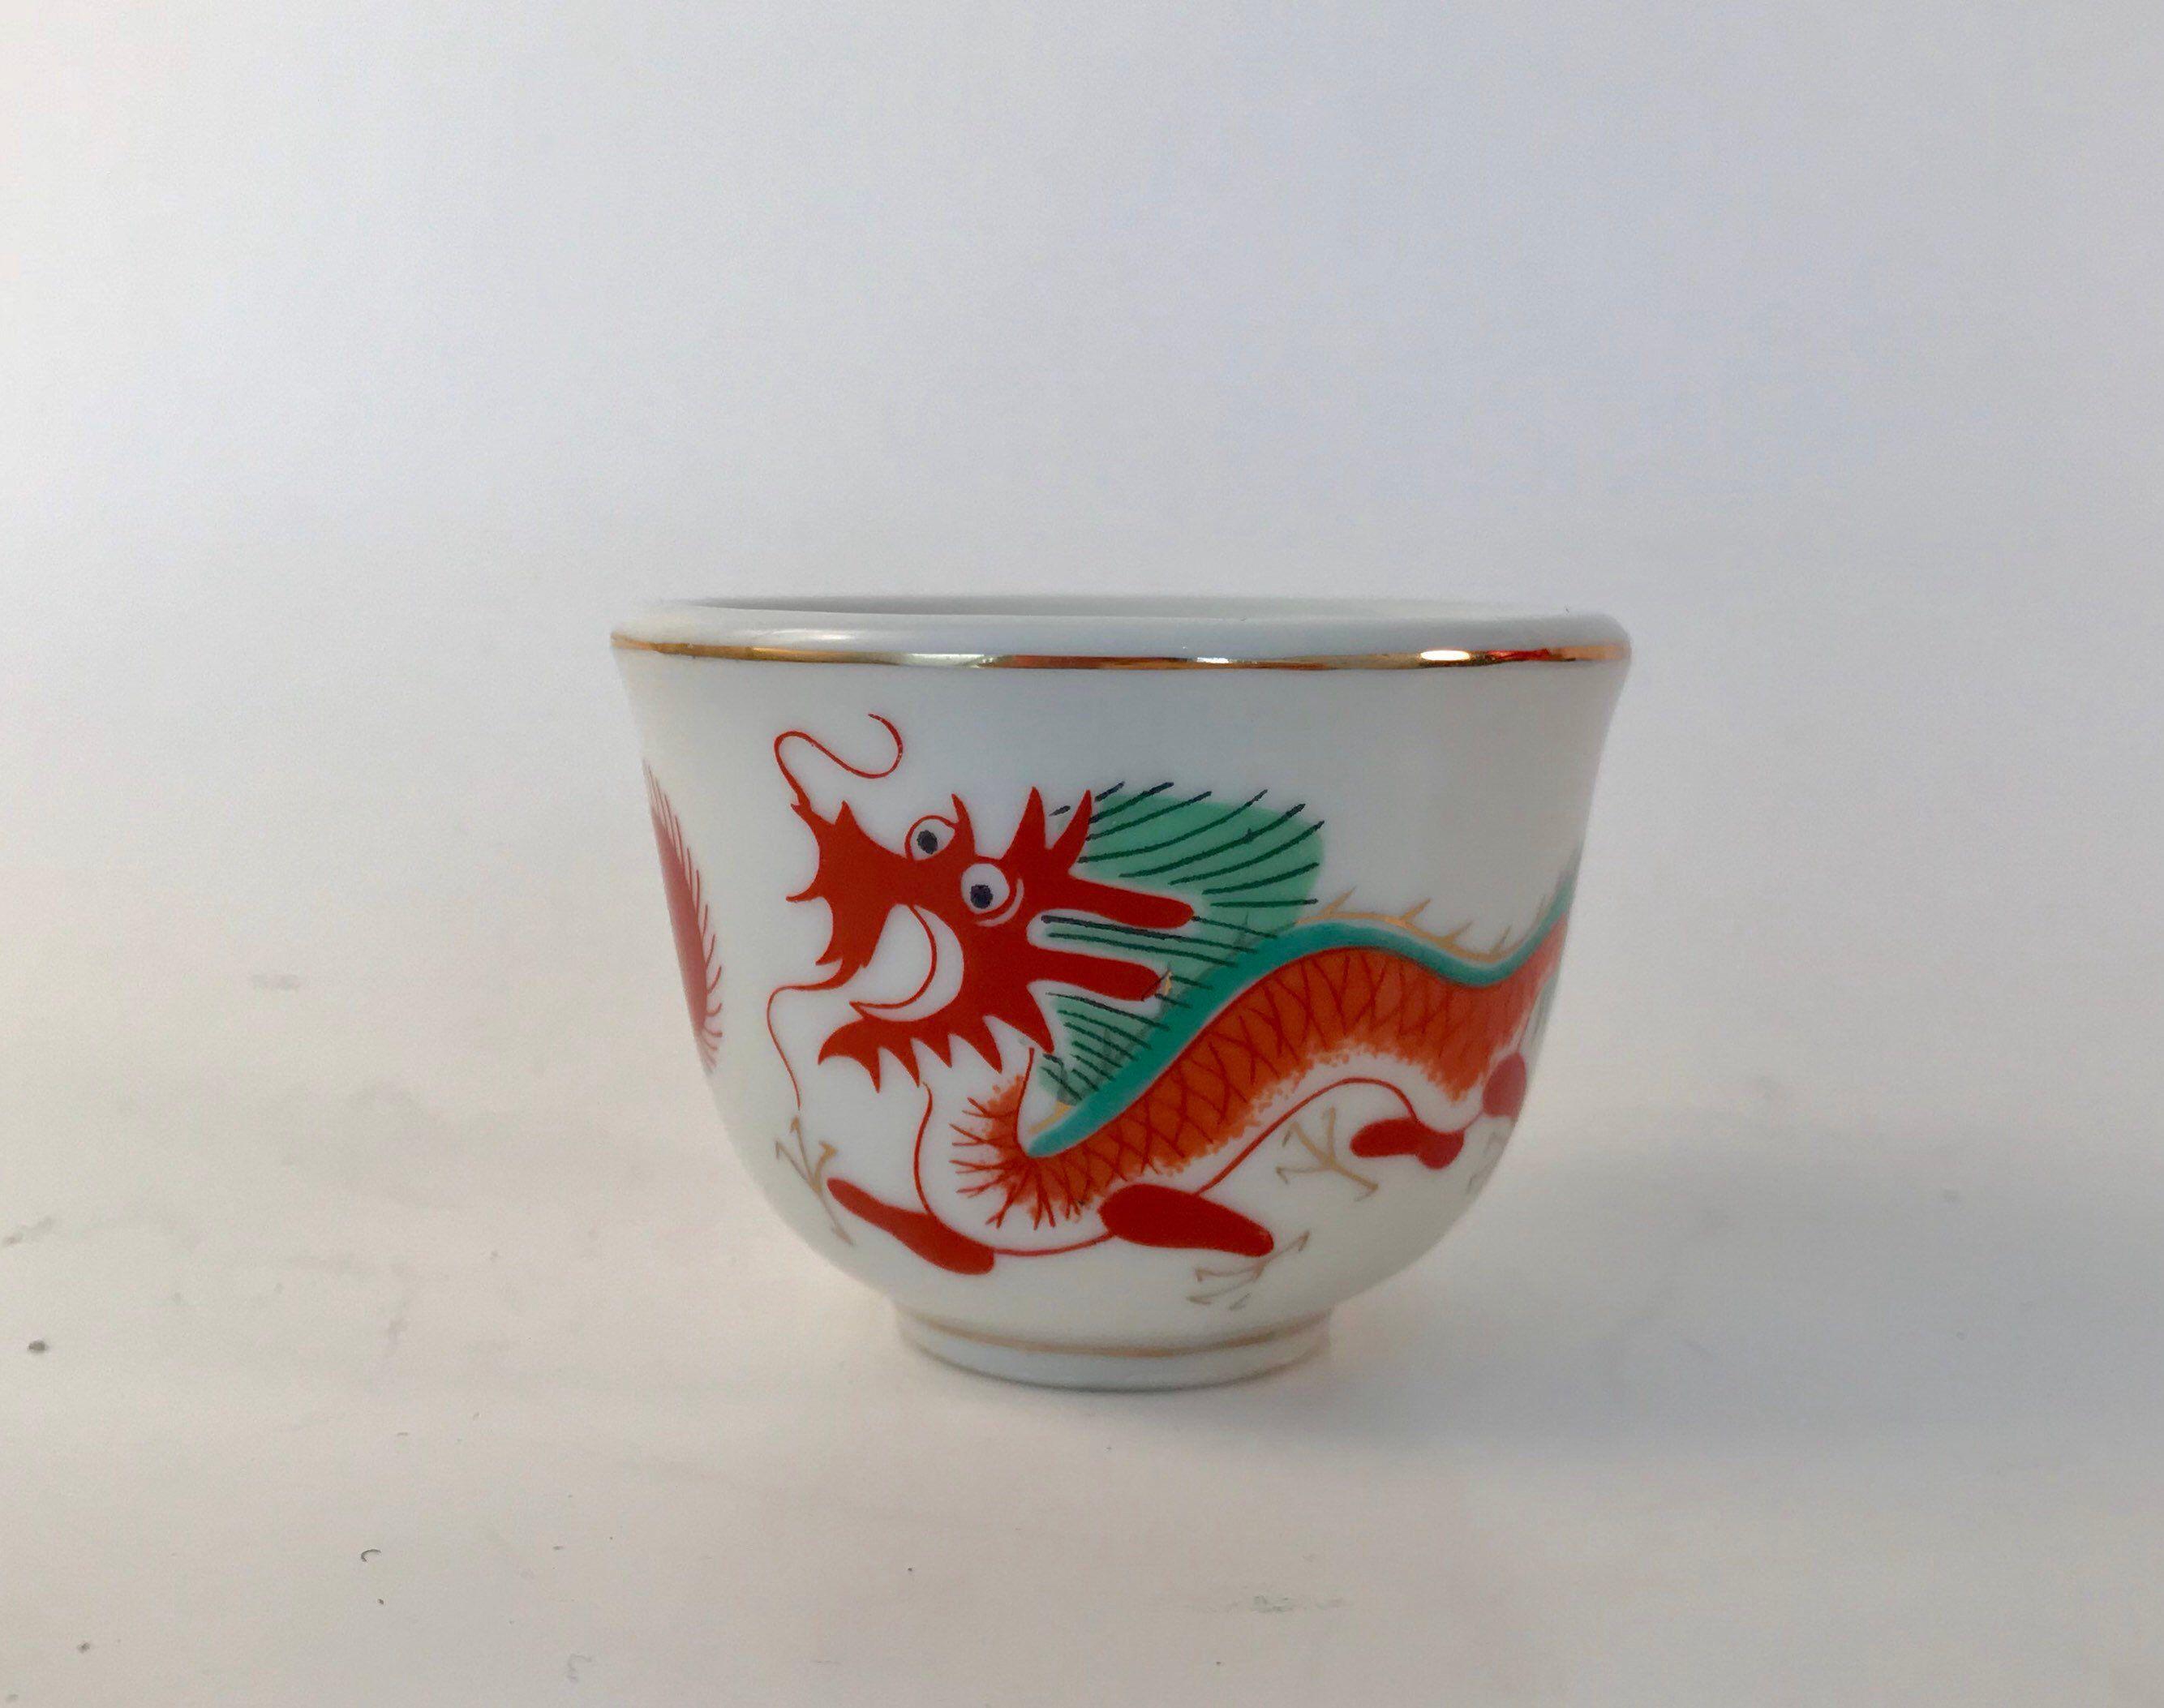 Vintage Asian Style Ceramic Tea Cup